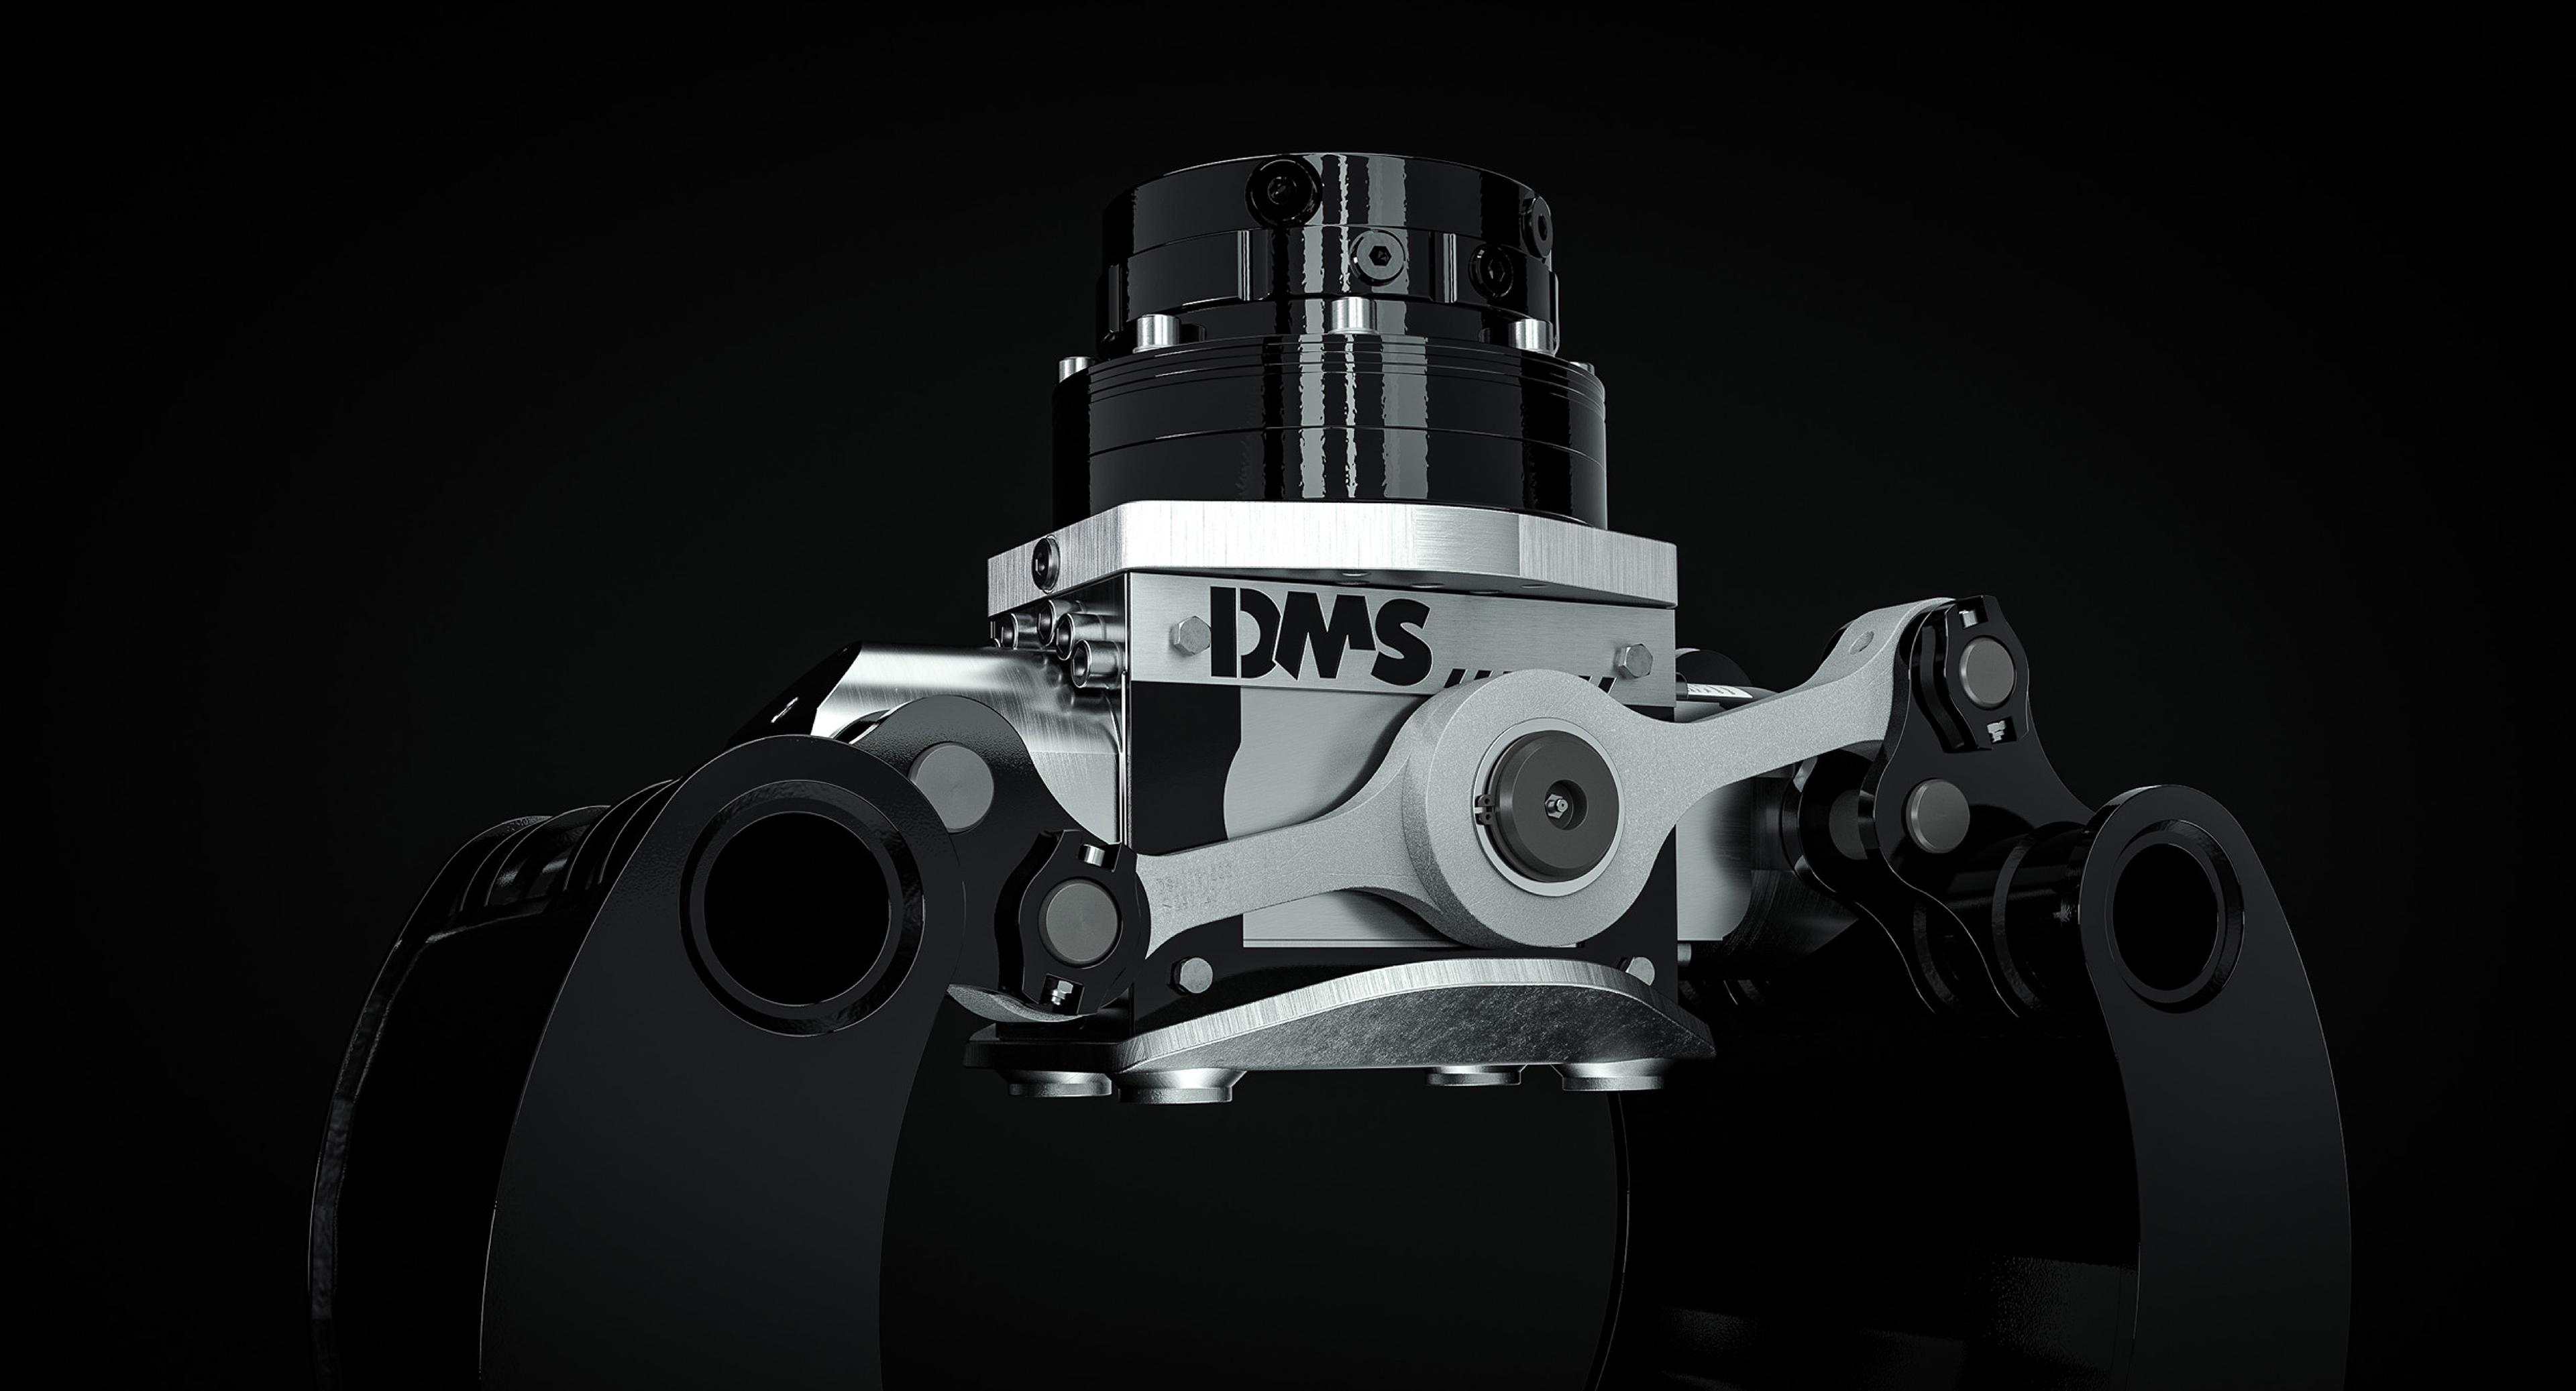 DMS – Brand Strategy, Website, Content, Fotografie - Markenbildung & Positionierung